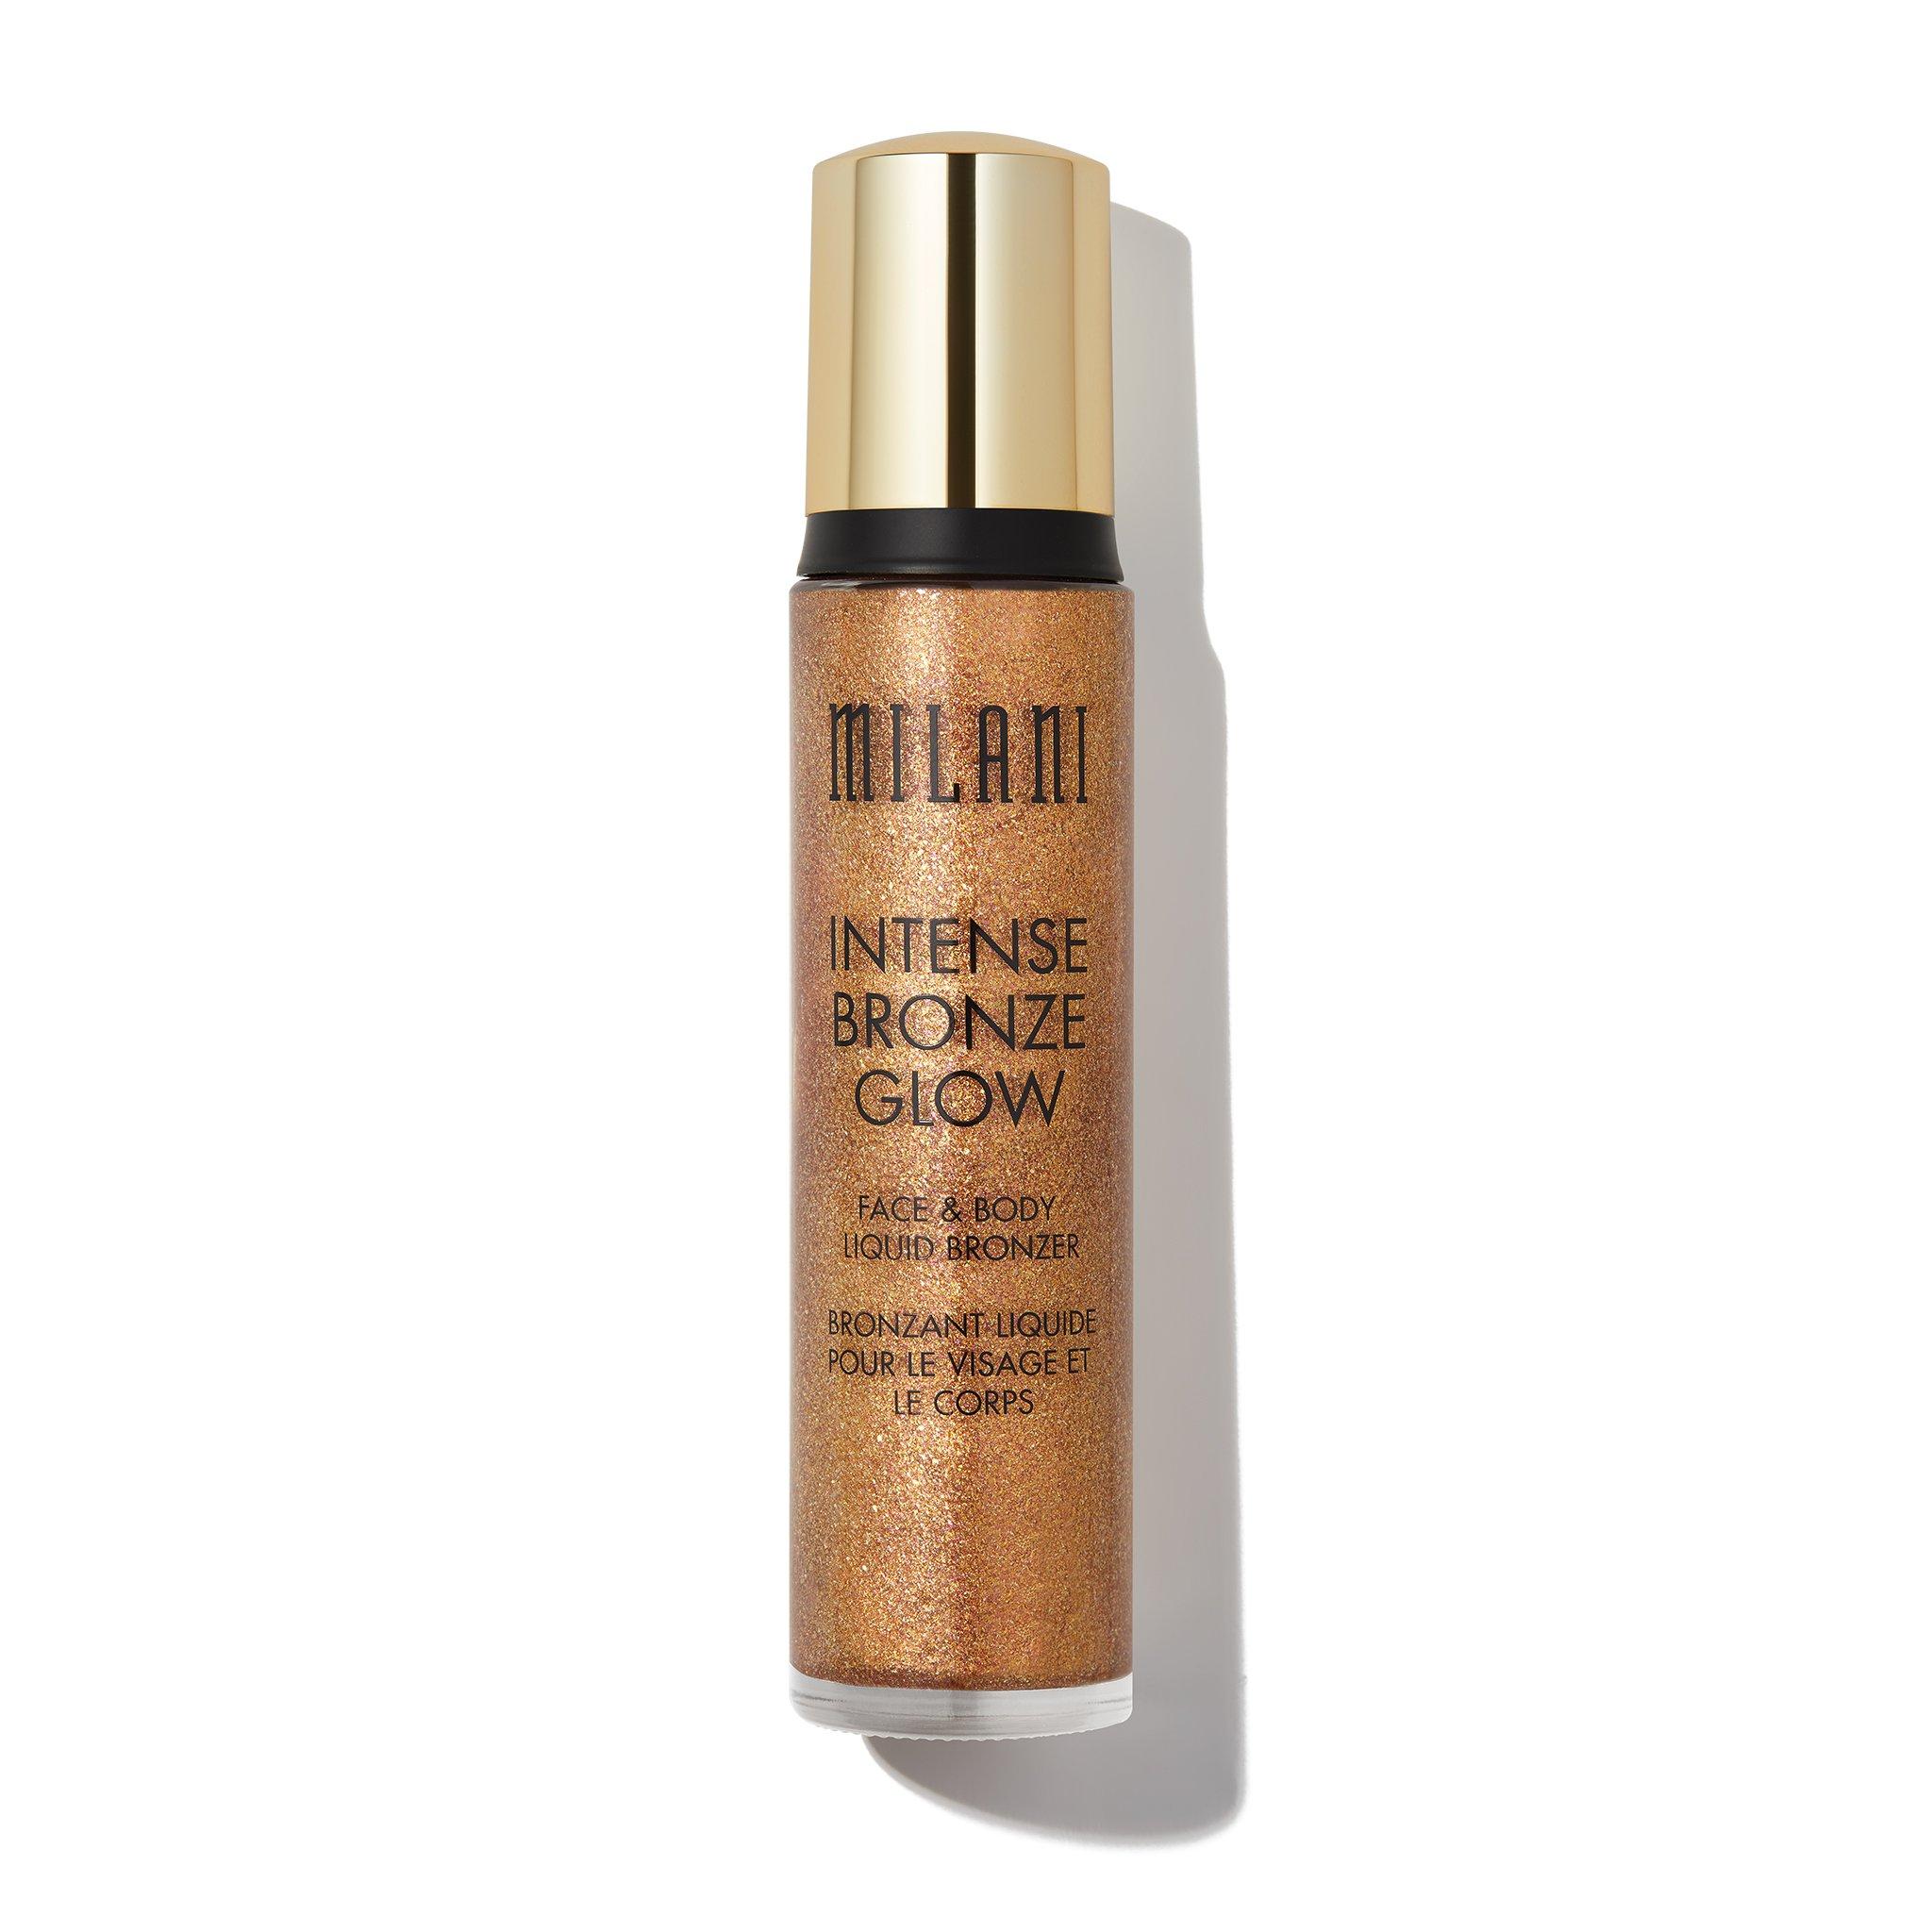 Intense Bronze Glow - Face & Body Liquid Bronzer